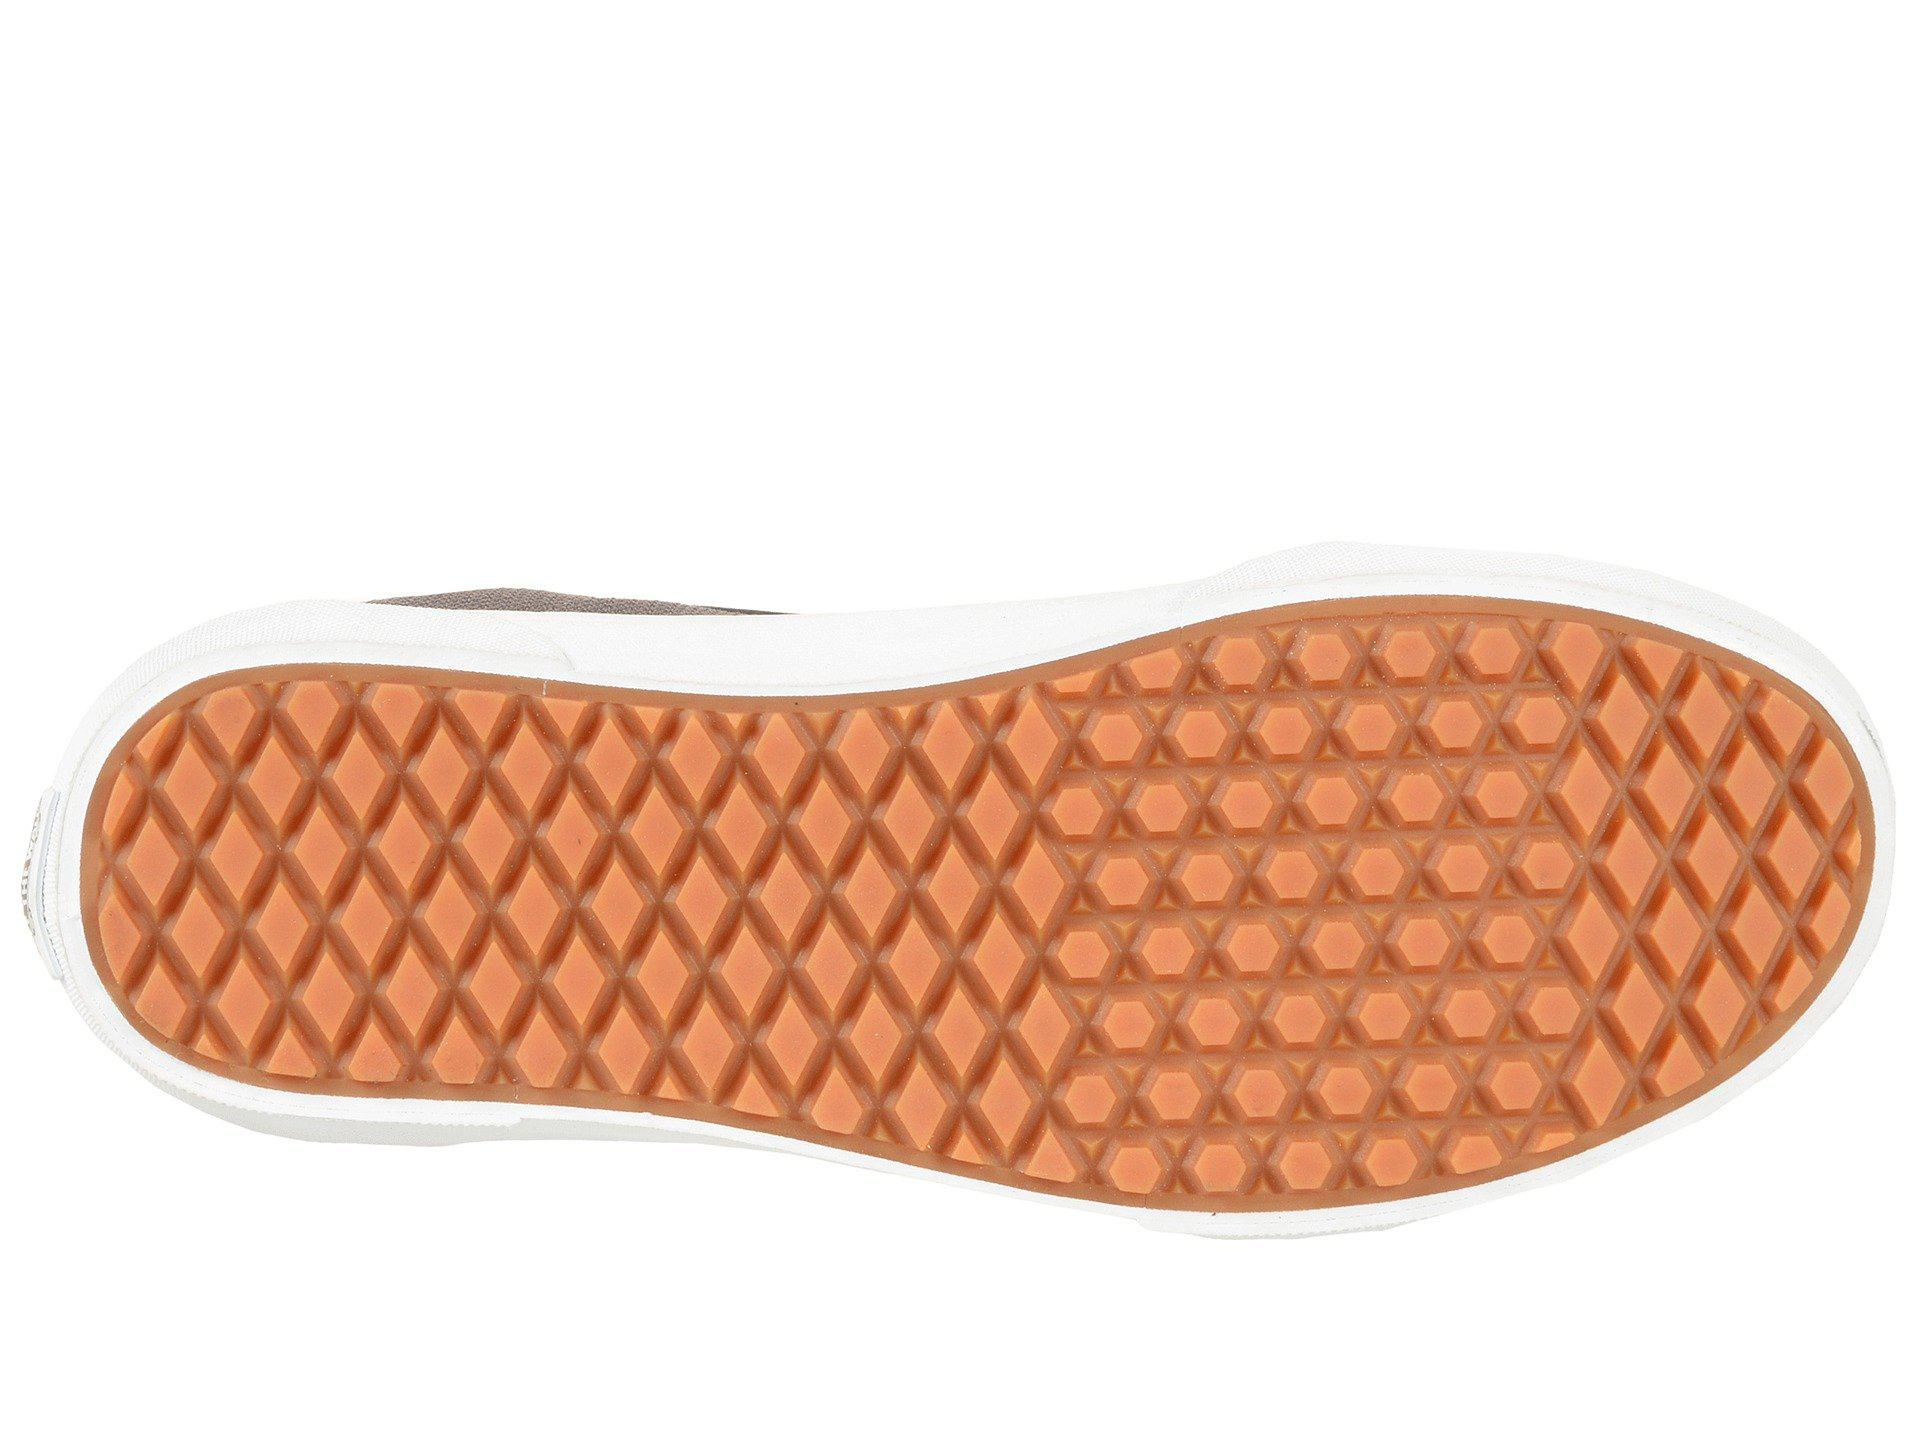 b1bbf63fae Lyst - Vans Sk8-hi Mte ((mte) Demitasse ballistic) Skate Shoes in ...